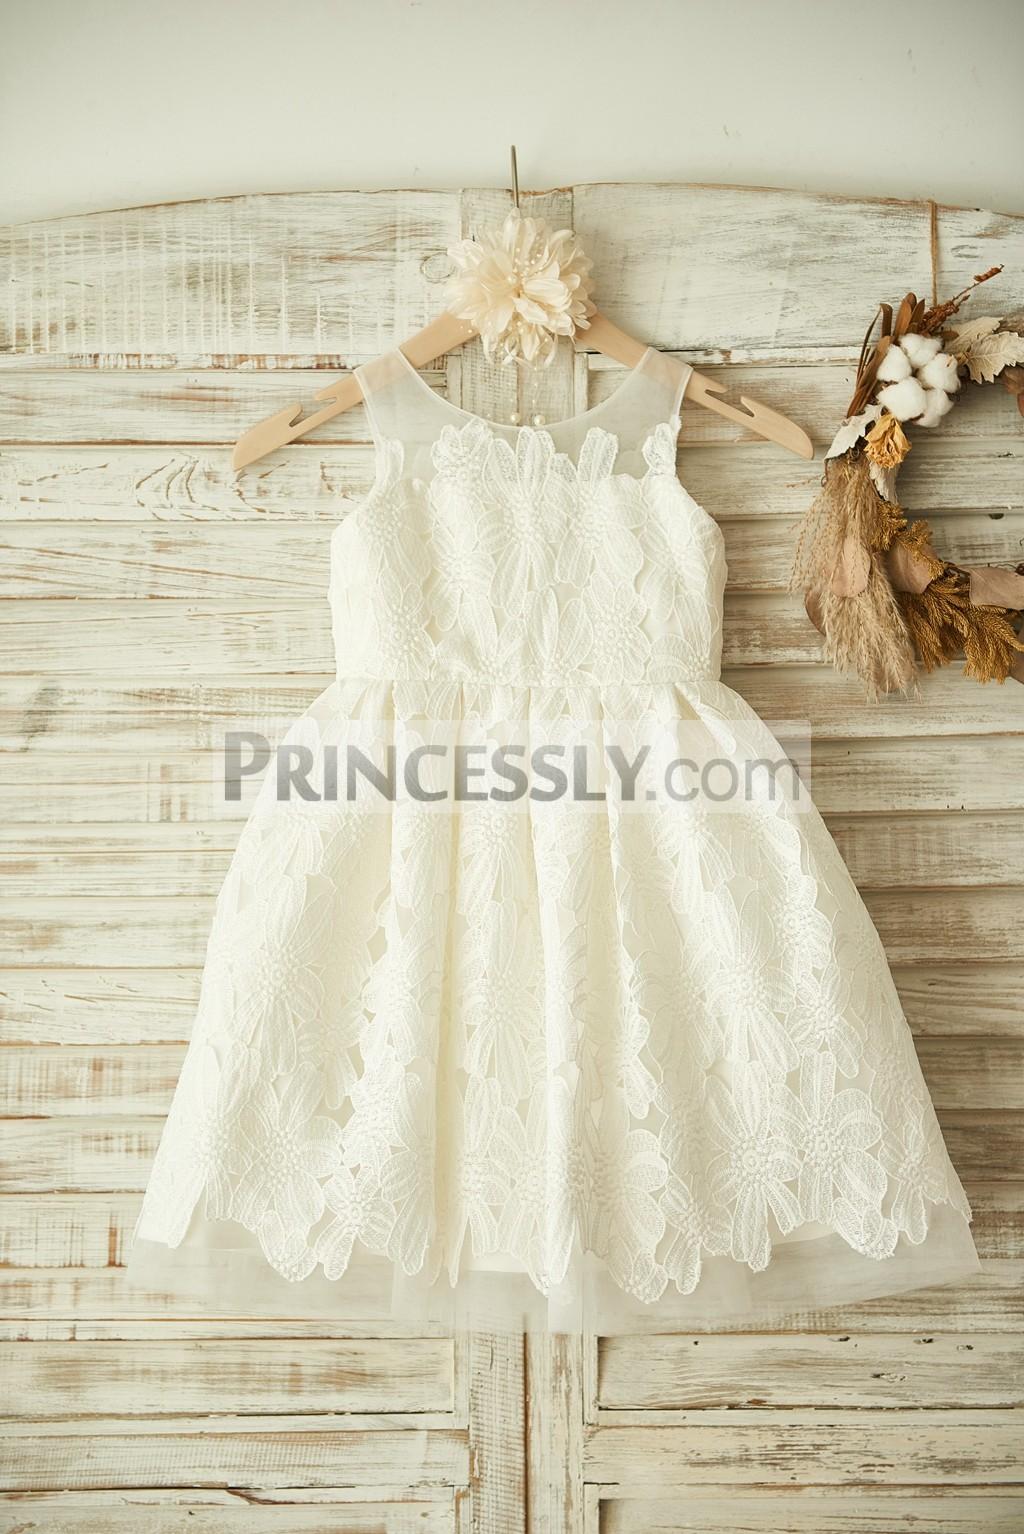 Ivory Sheer Neck Lace Applique Tulle Wedding Flower Girl Dress